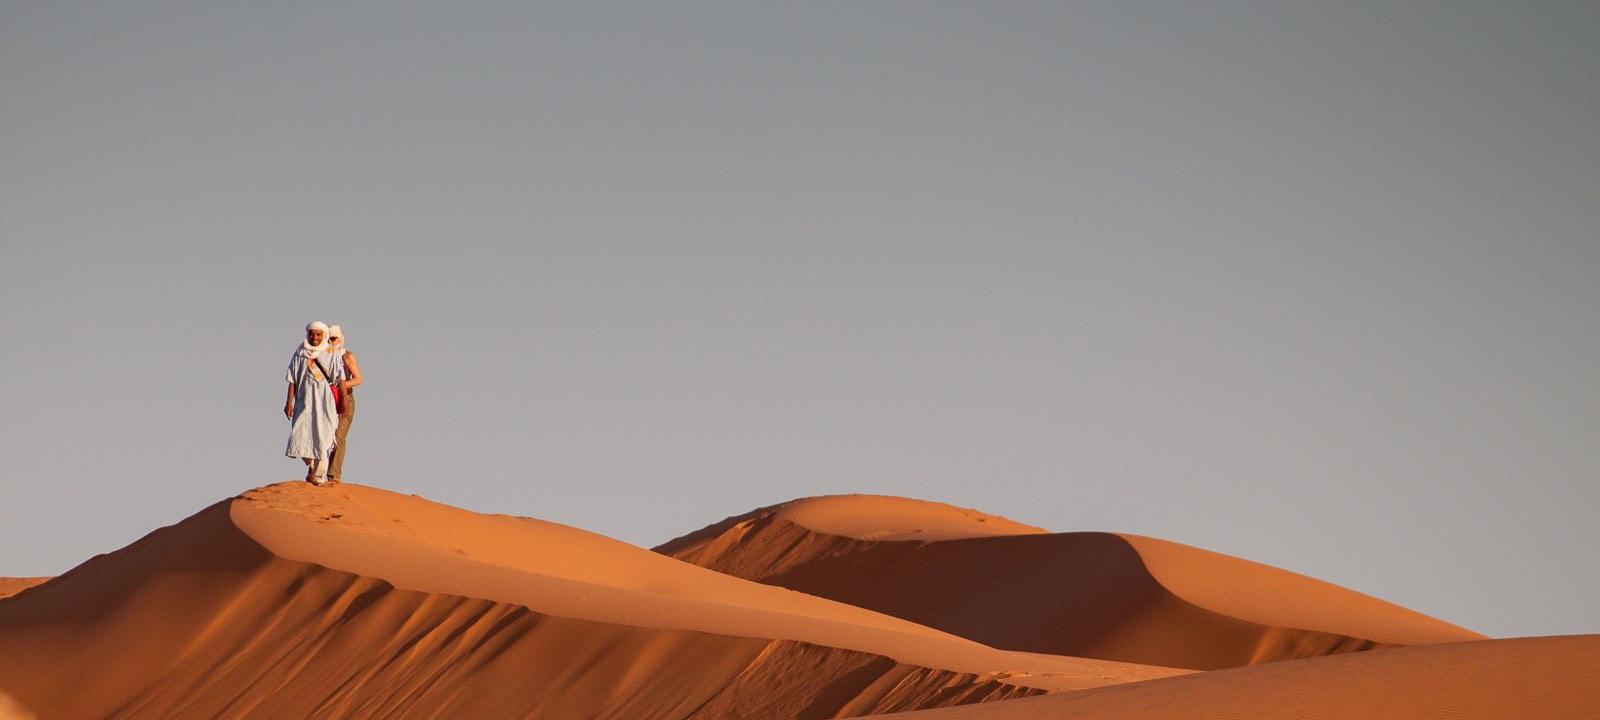 Maroc Désert et Aventures